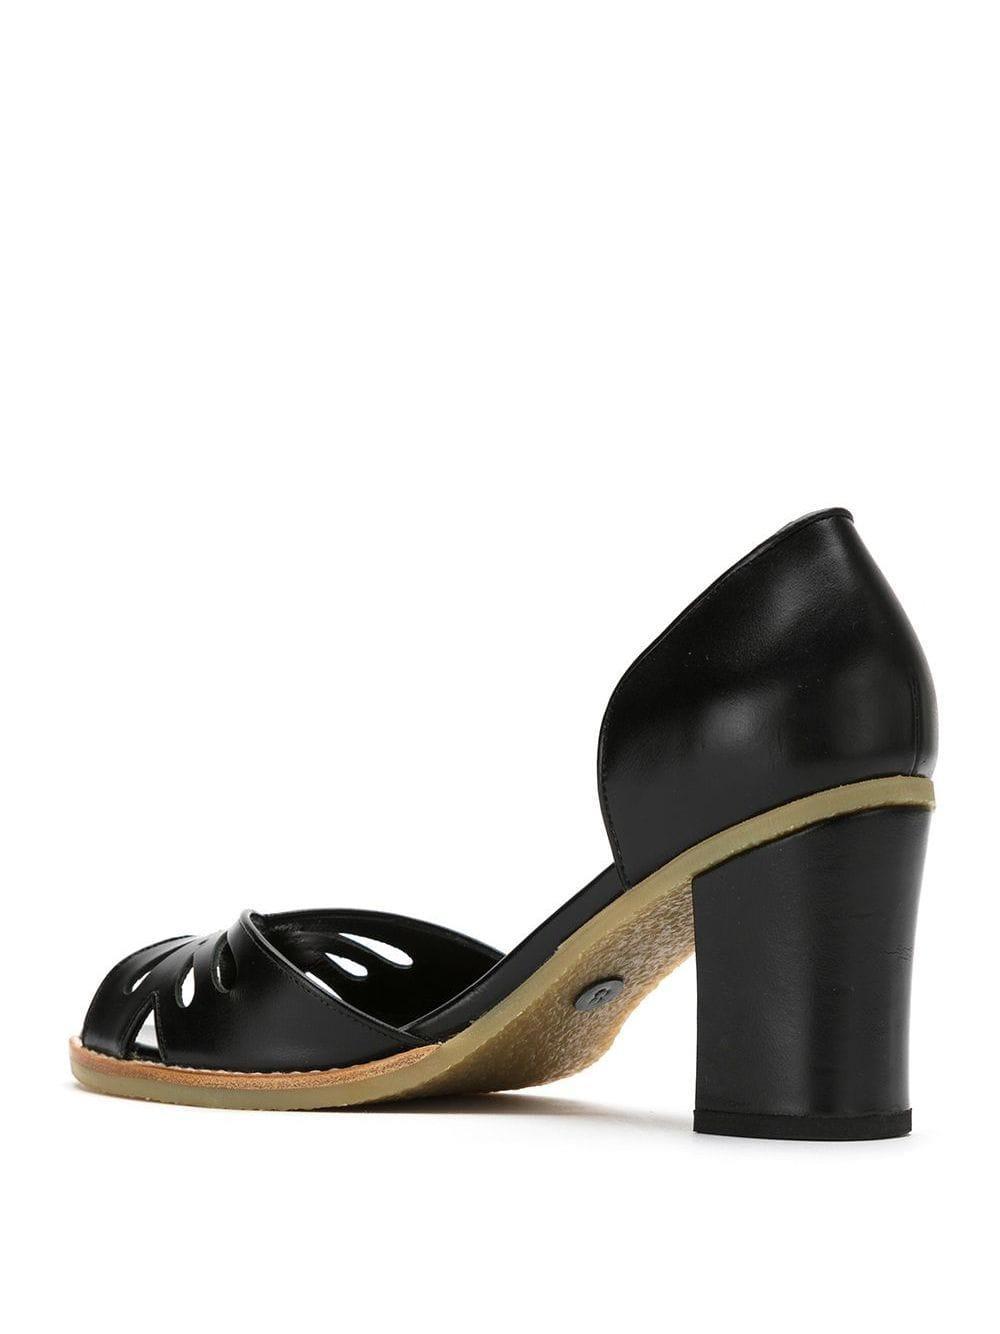 Zapatos de tacón Sarah Chofakian de Cuero de color Negro